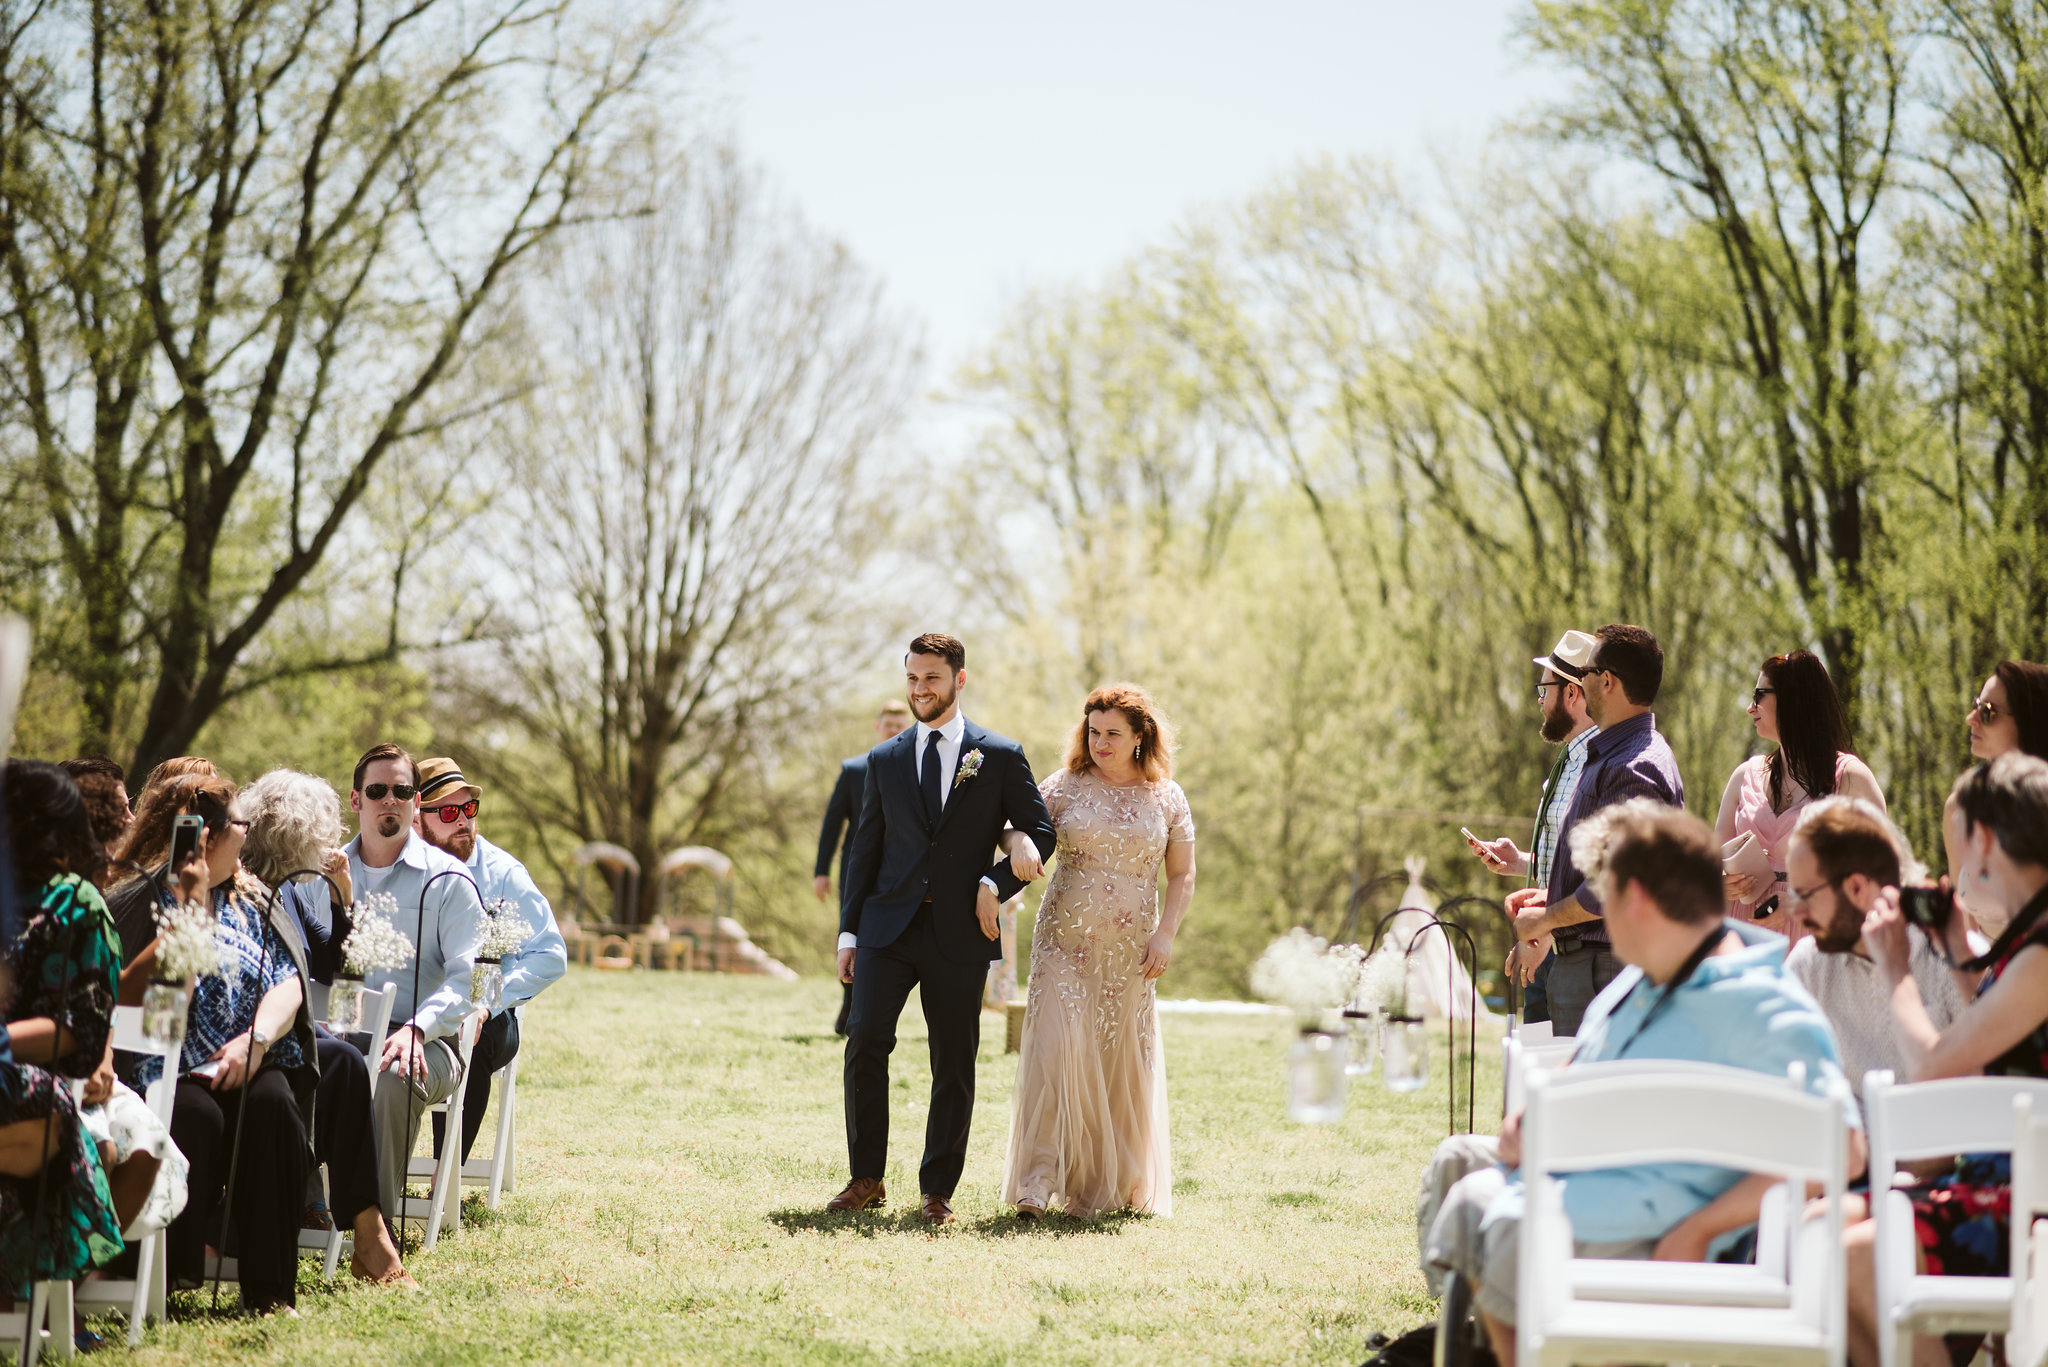 Spring Outdoor Wedding, Park, Baltimore Wedding Photographer, DIY, Classic, Upcycled, Garden Party, Romantic, Groom Walking Down Aisle, Sunshine